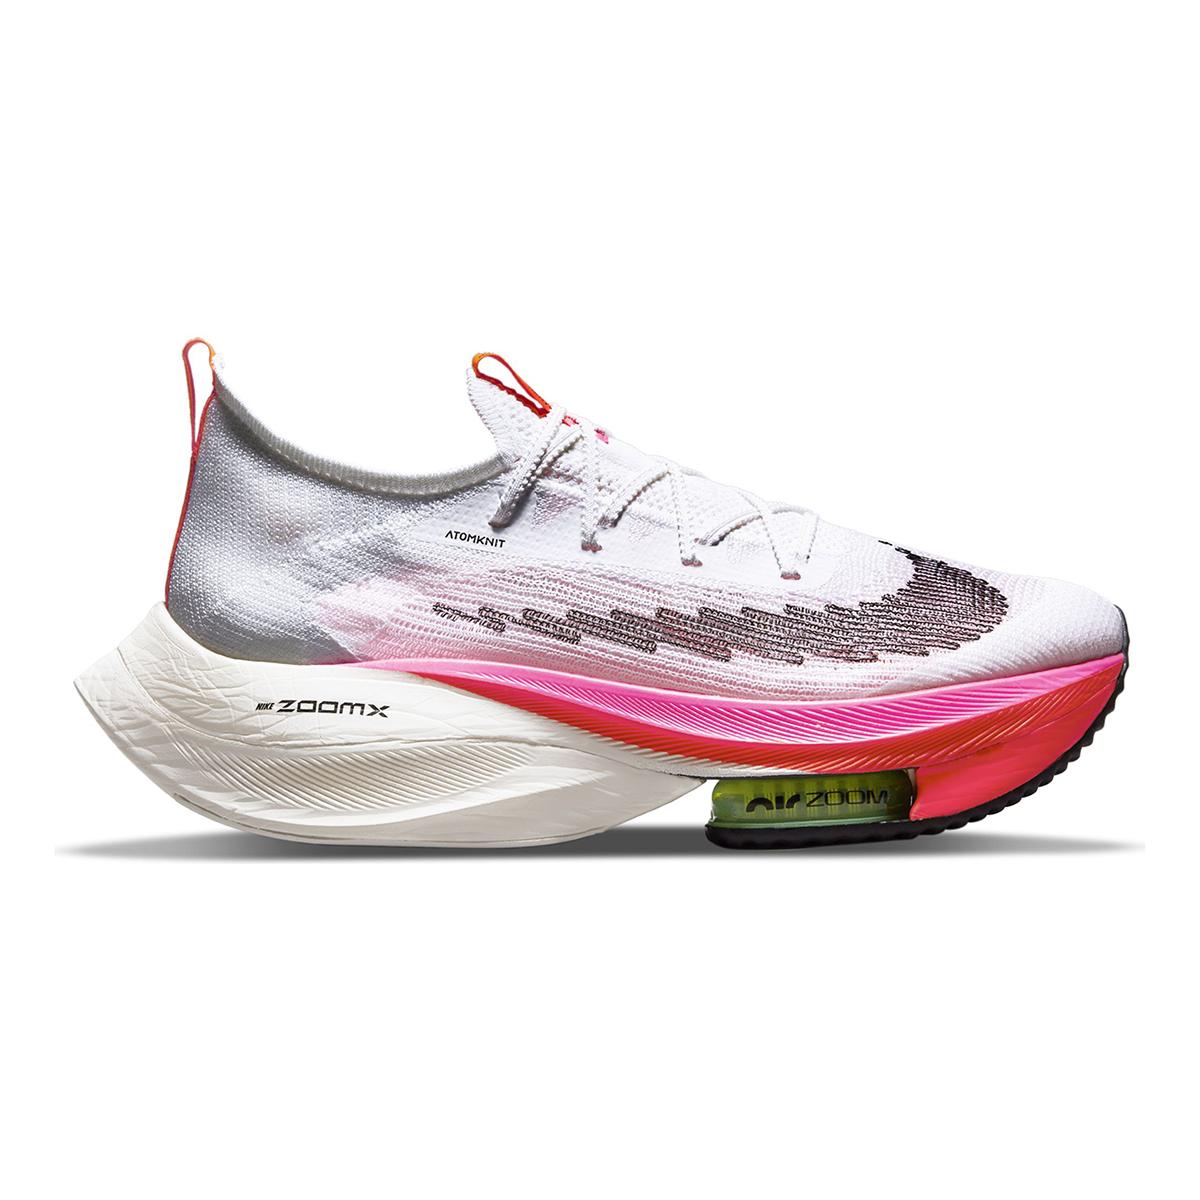 Men's Nike Air Zoom Alphafly Next% Flyknit Running Shoe - Color: Rawdacious - Size: 6 - Width: Regular, Rawdacious, large, image 1